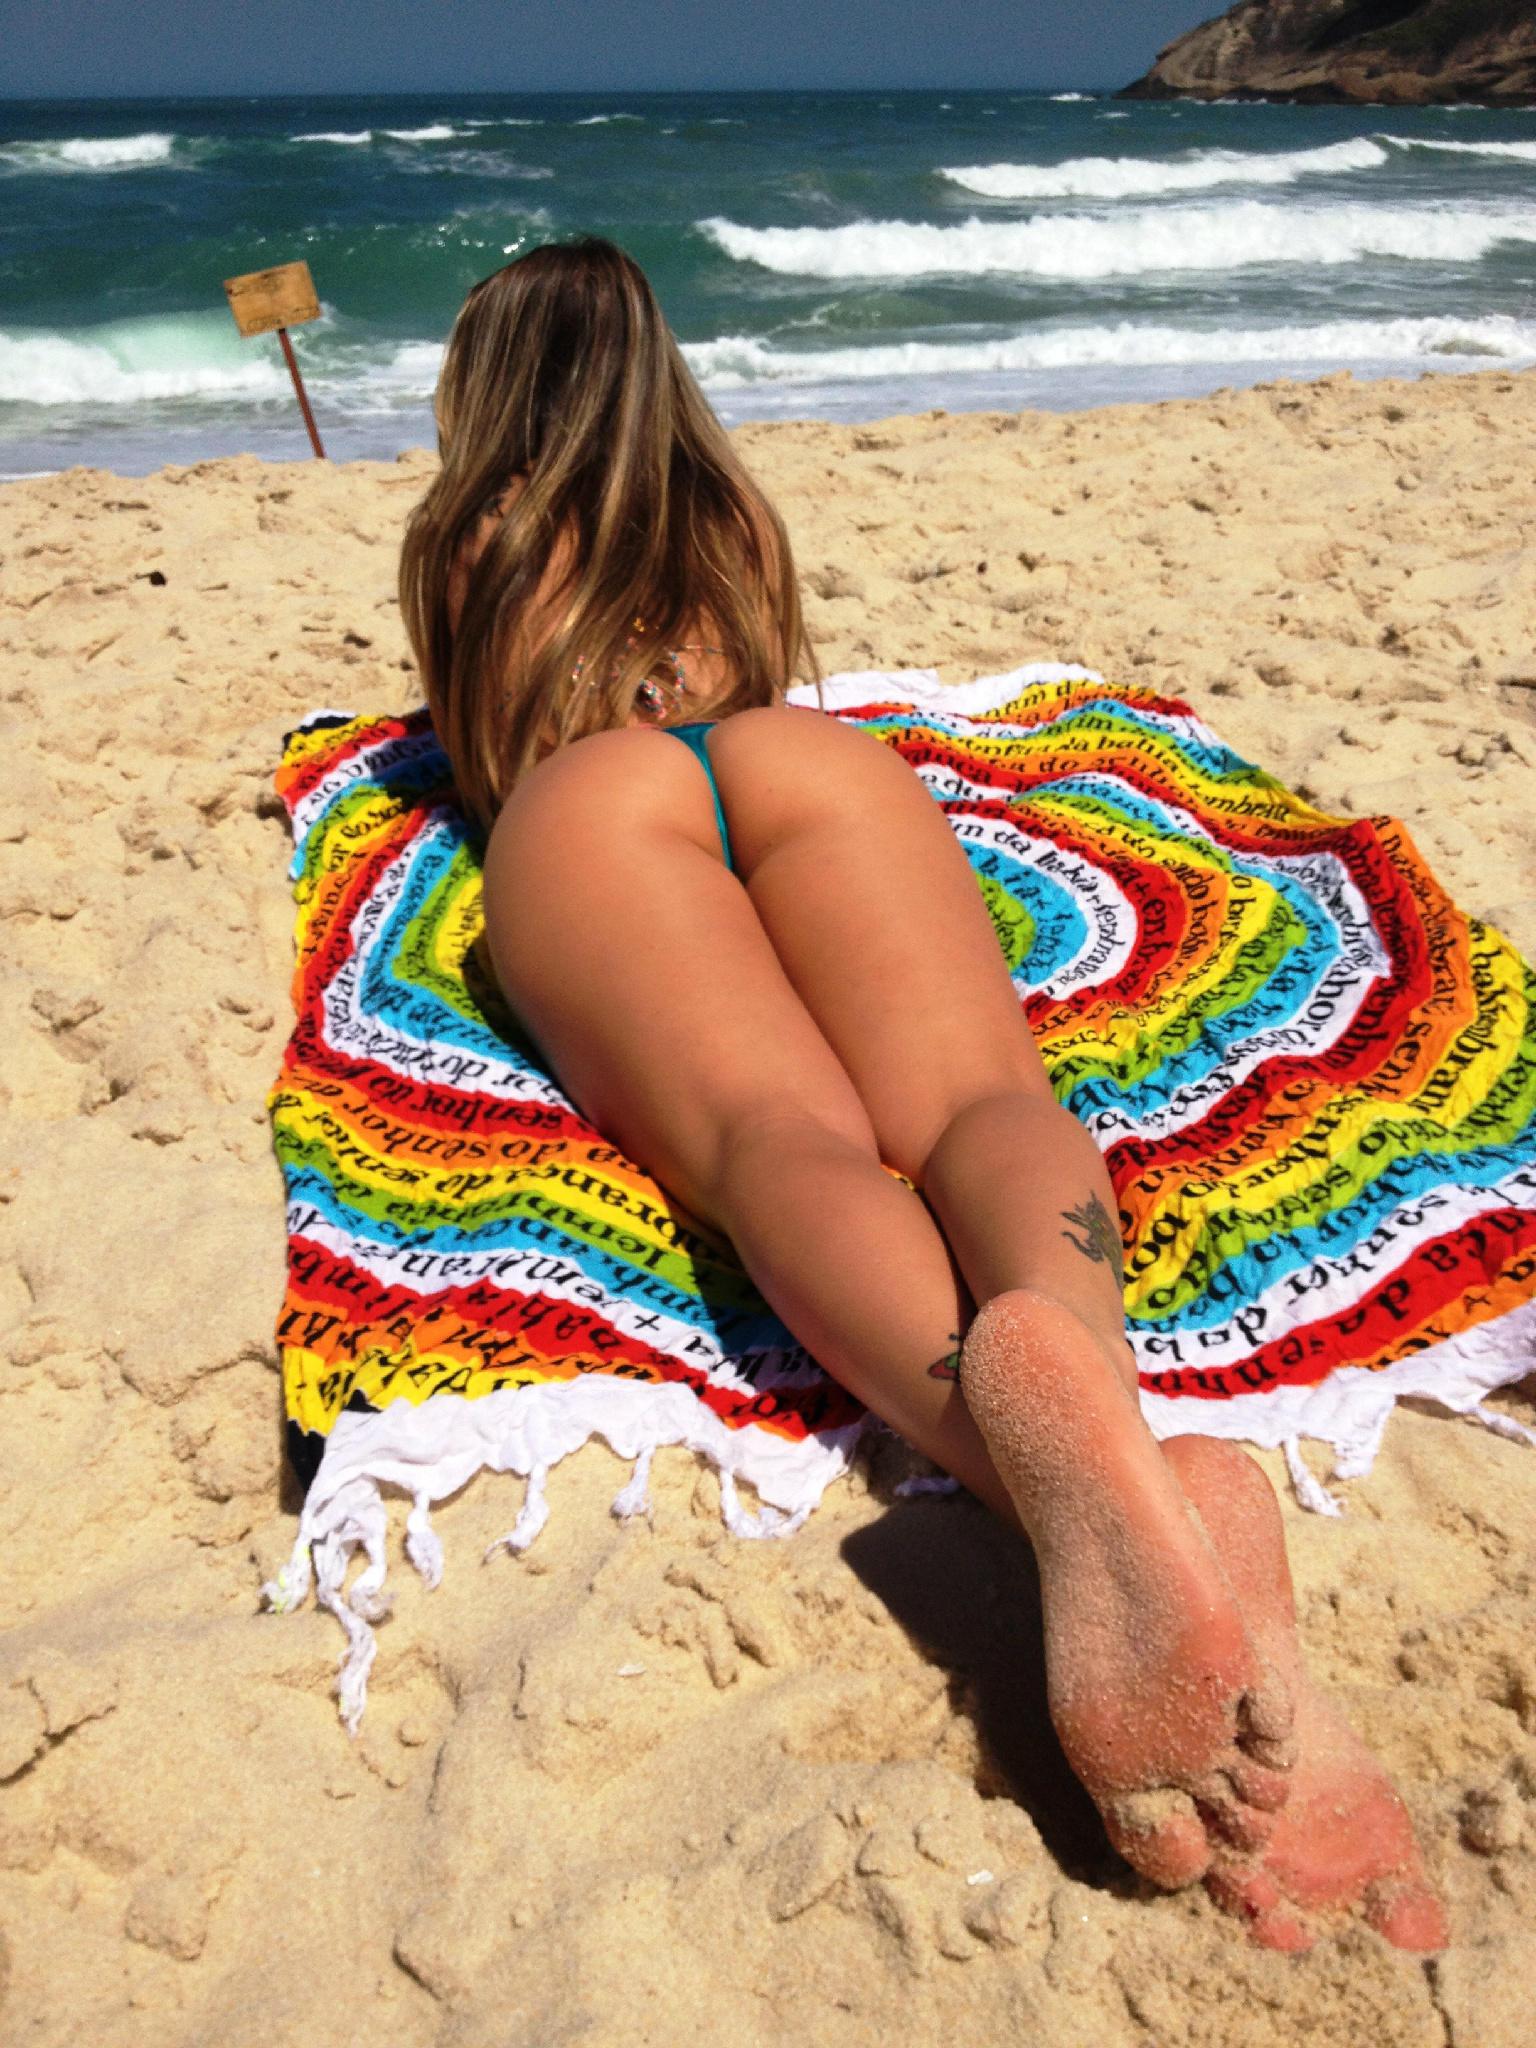 Redtube villagirls nude photos